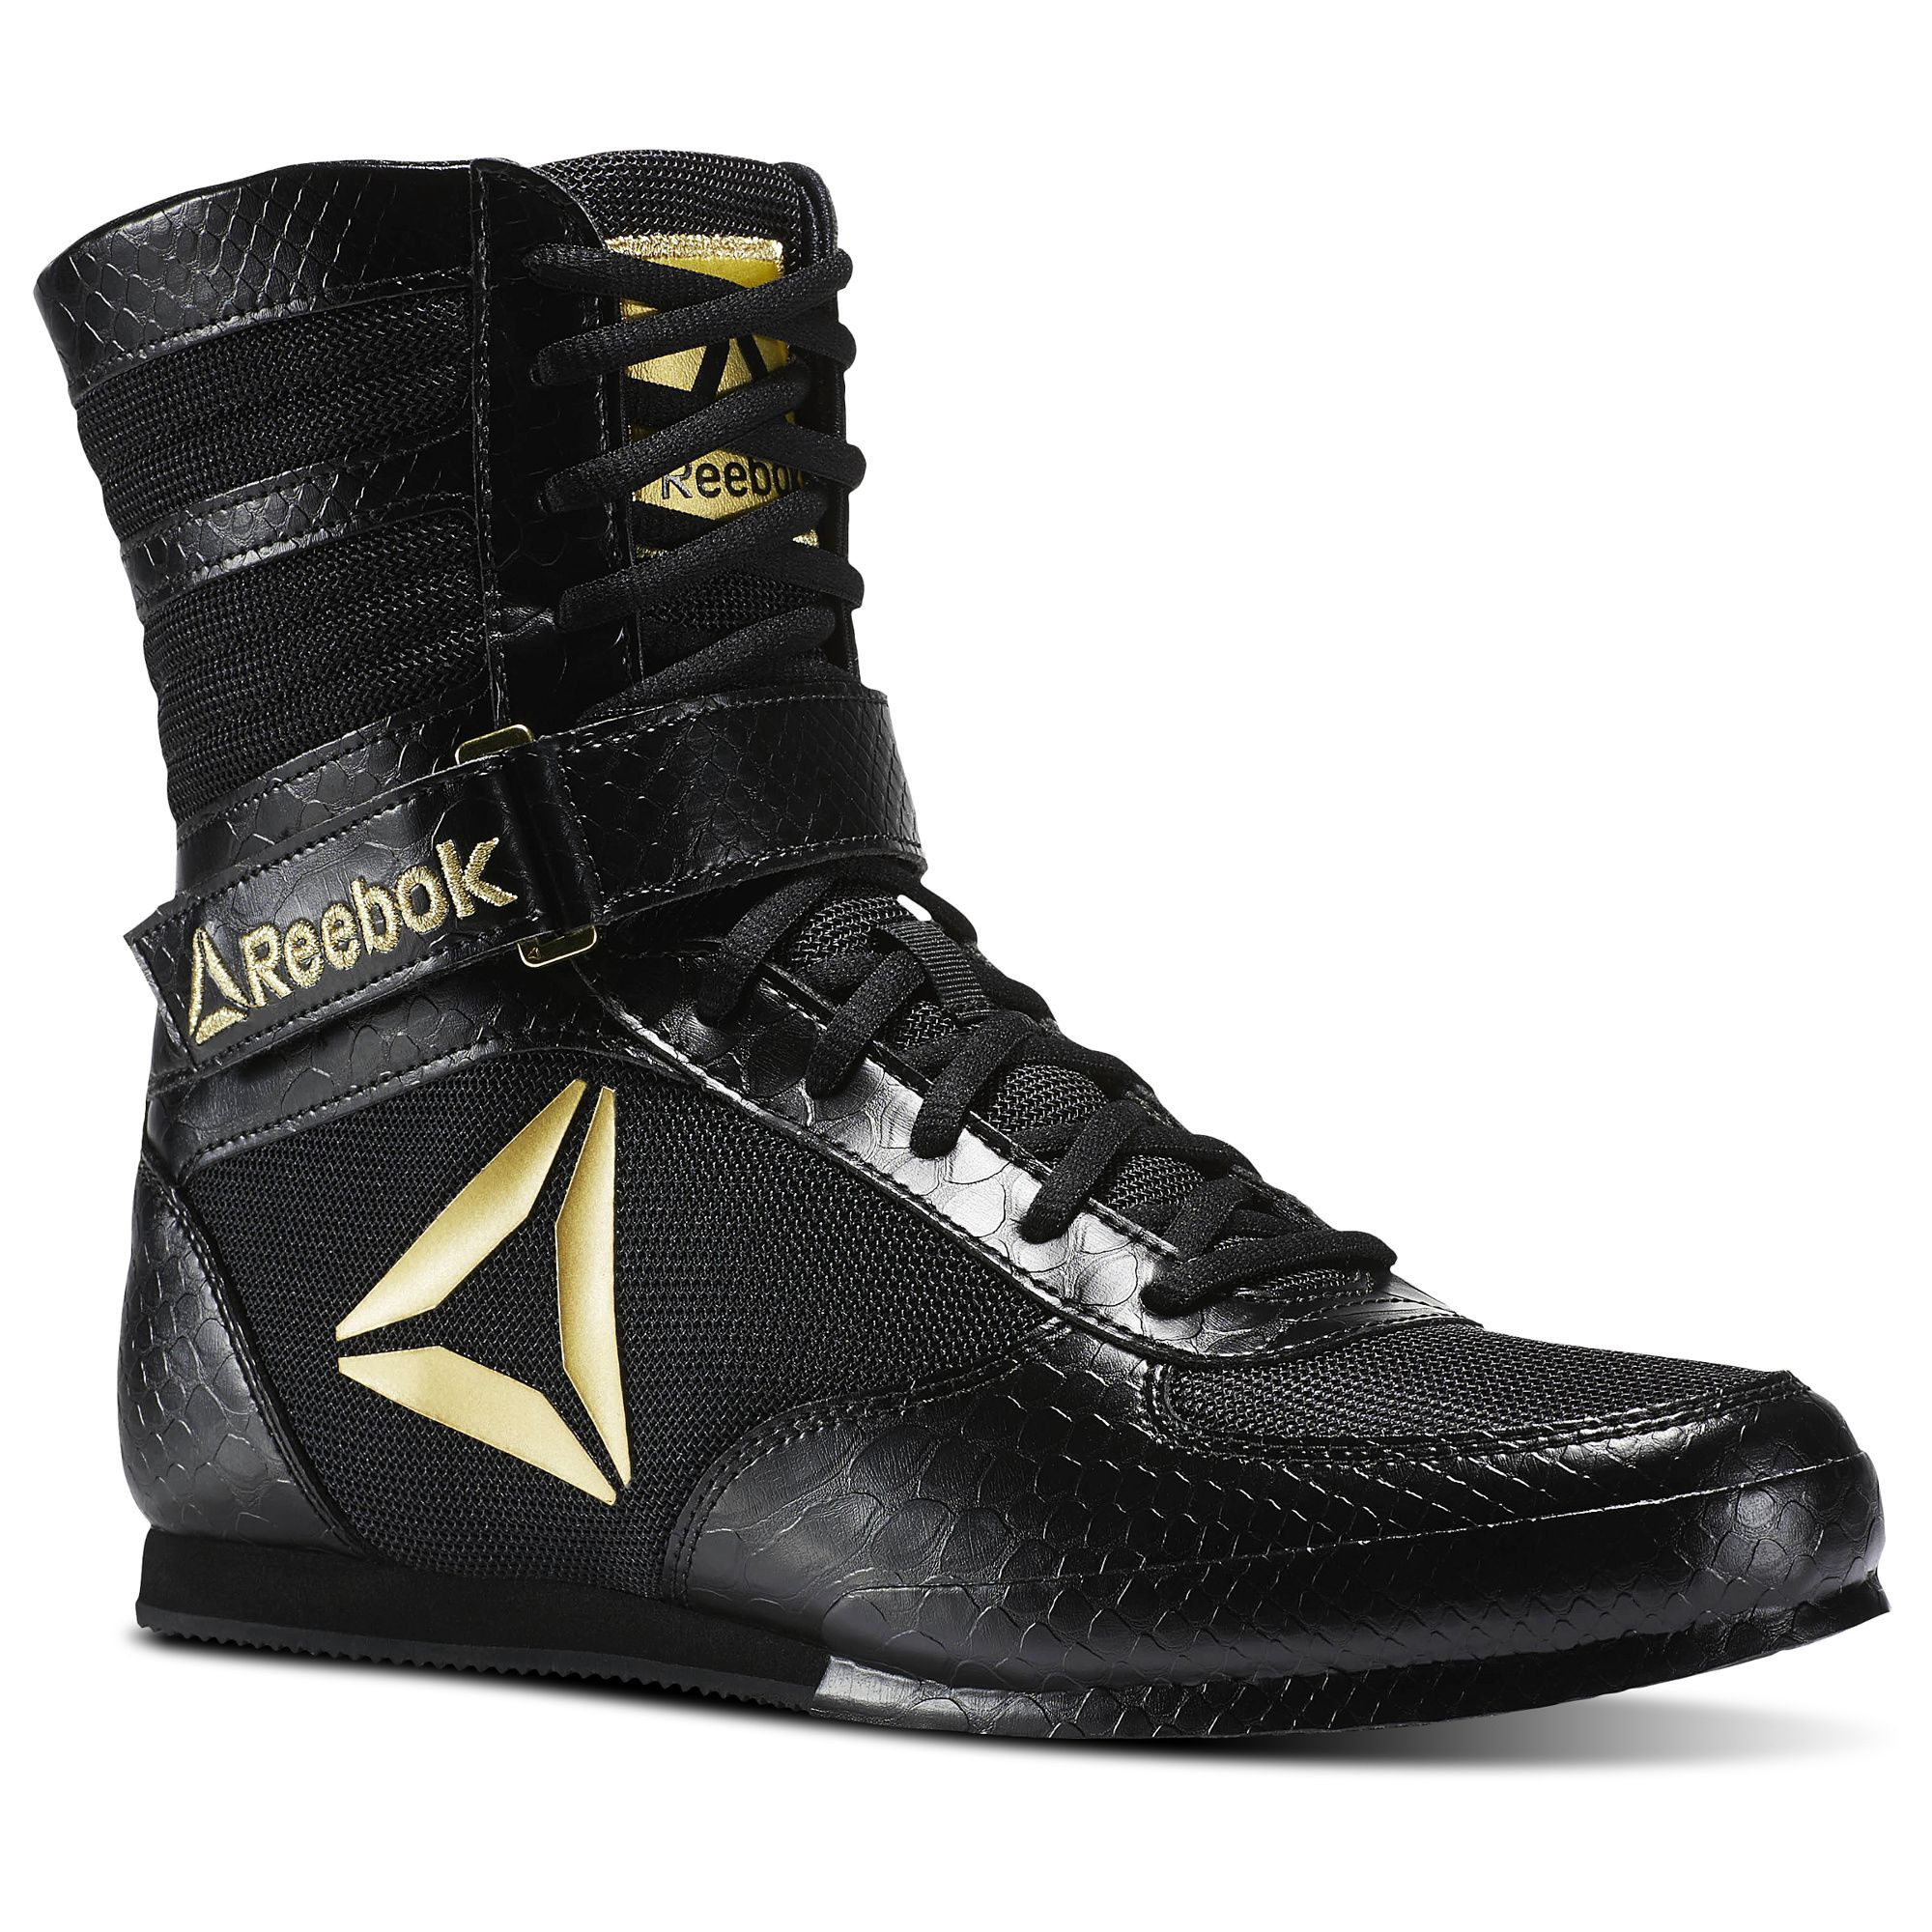 Reebok Men's Reebok Boxing Boot | Boxing boots, Boots